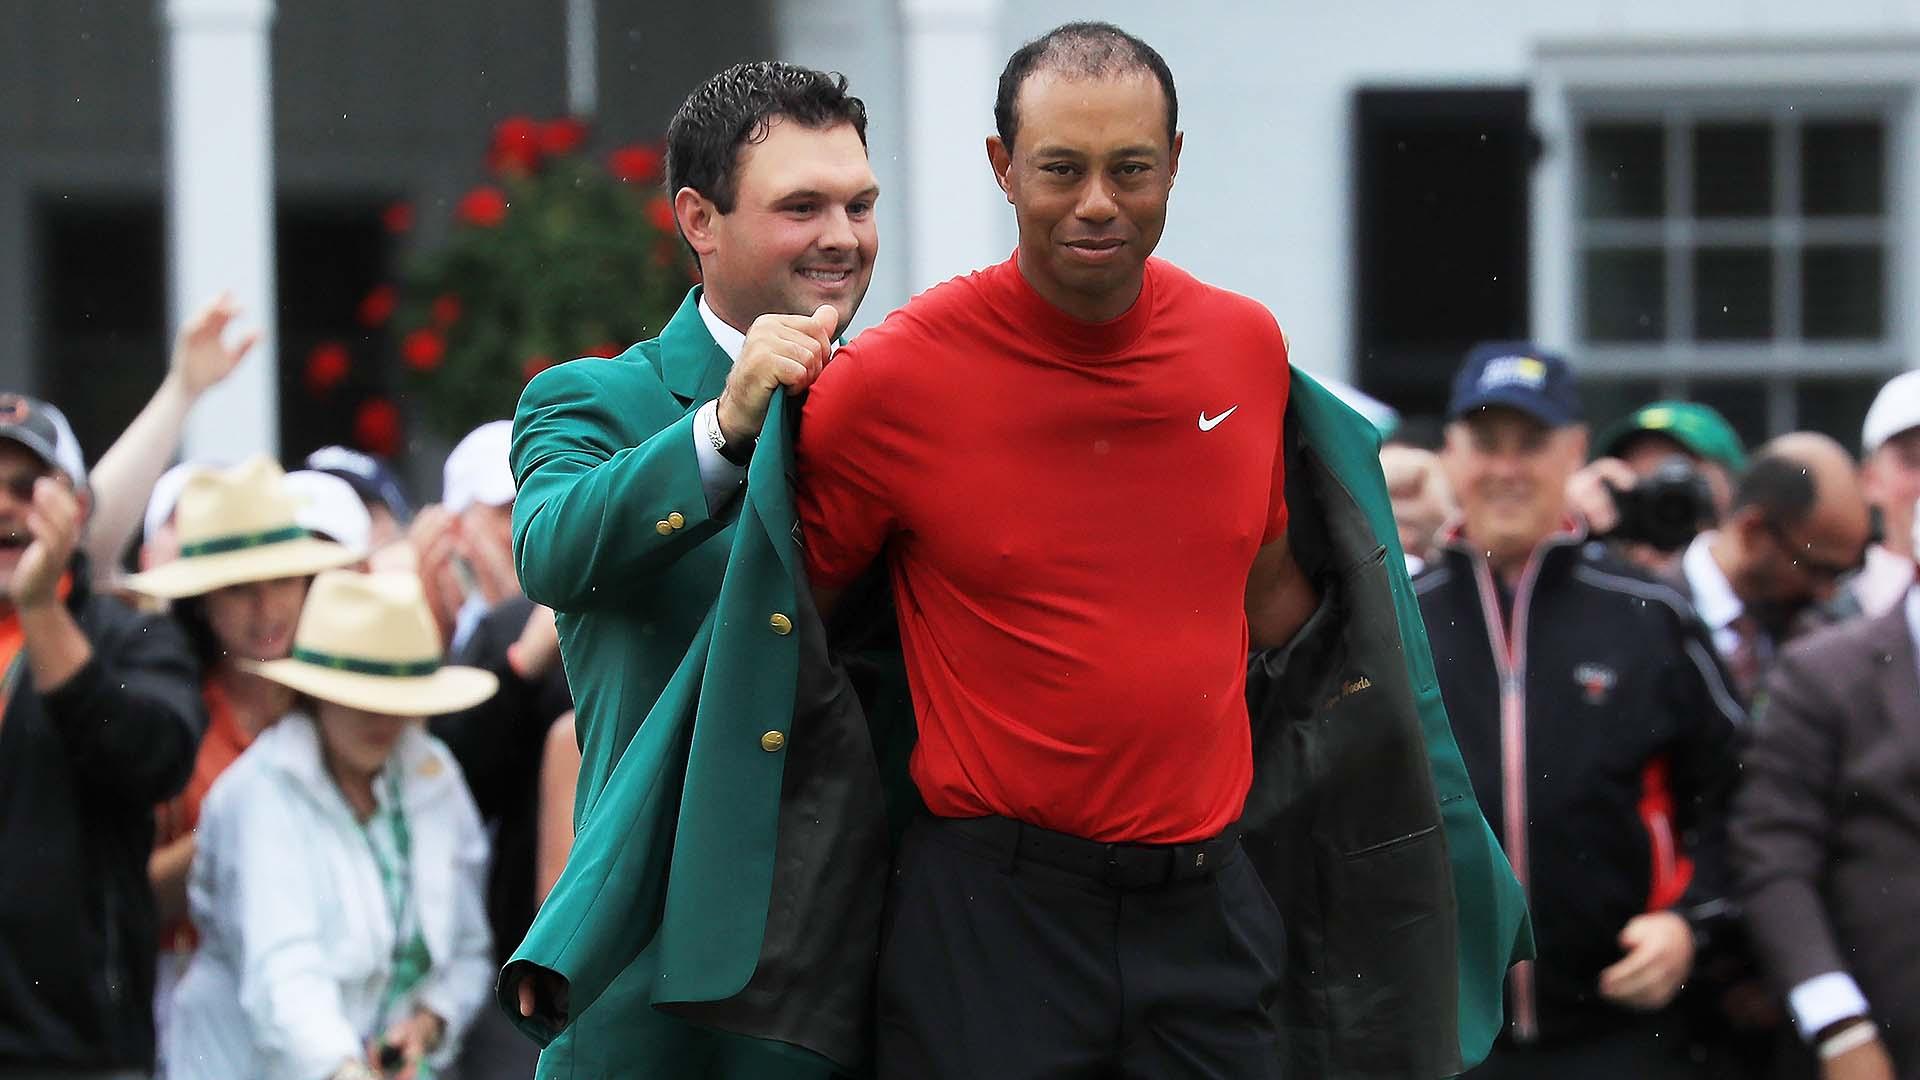 TT Postscript: Tiger Woods wins 15th major at 2019 Masters